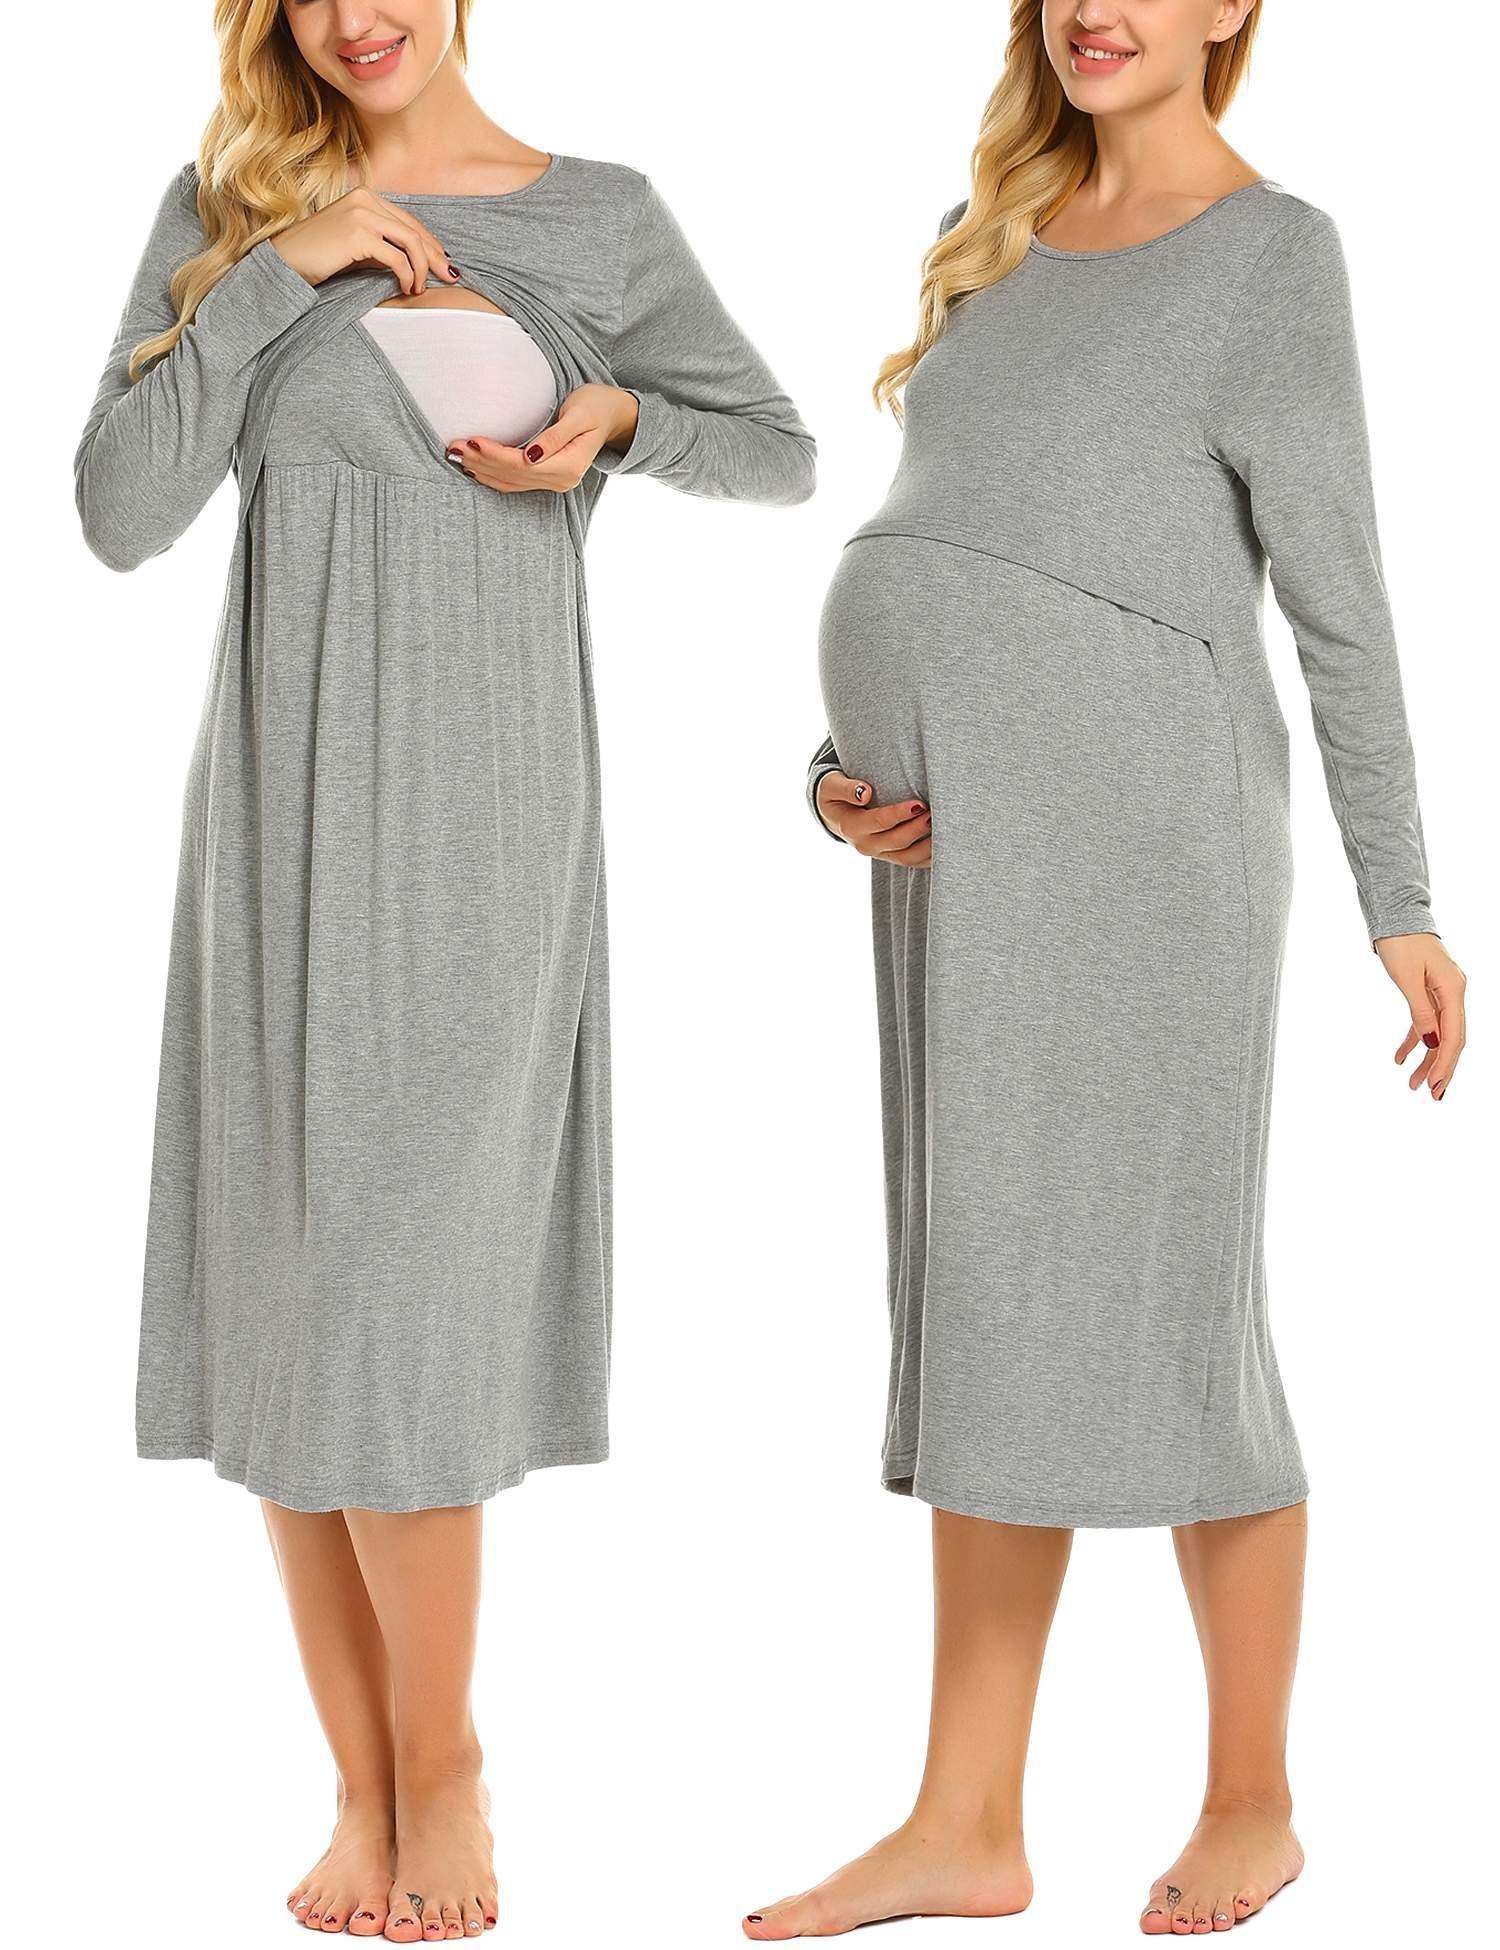 Ekouaer Womens Layered Maternity Dress Empire Waist Nursing Breastfeeding Dress